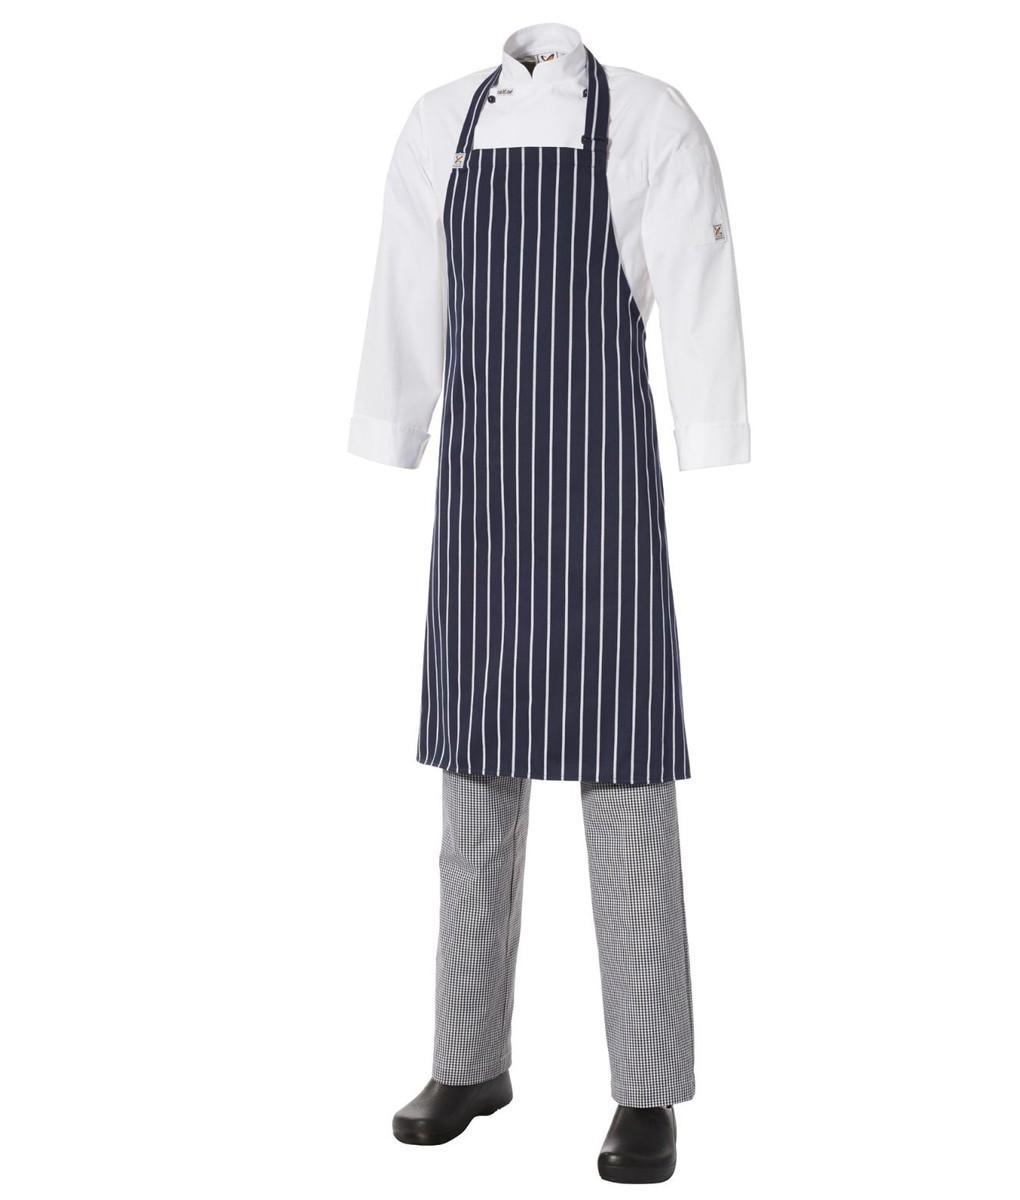 5 for the price of 4: Bib Apron Pinstripe - Medium - Navy/White by Club Chef